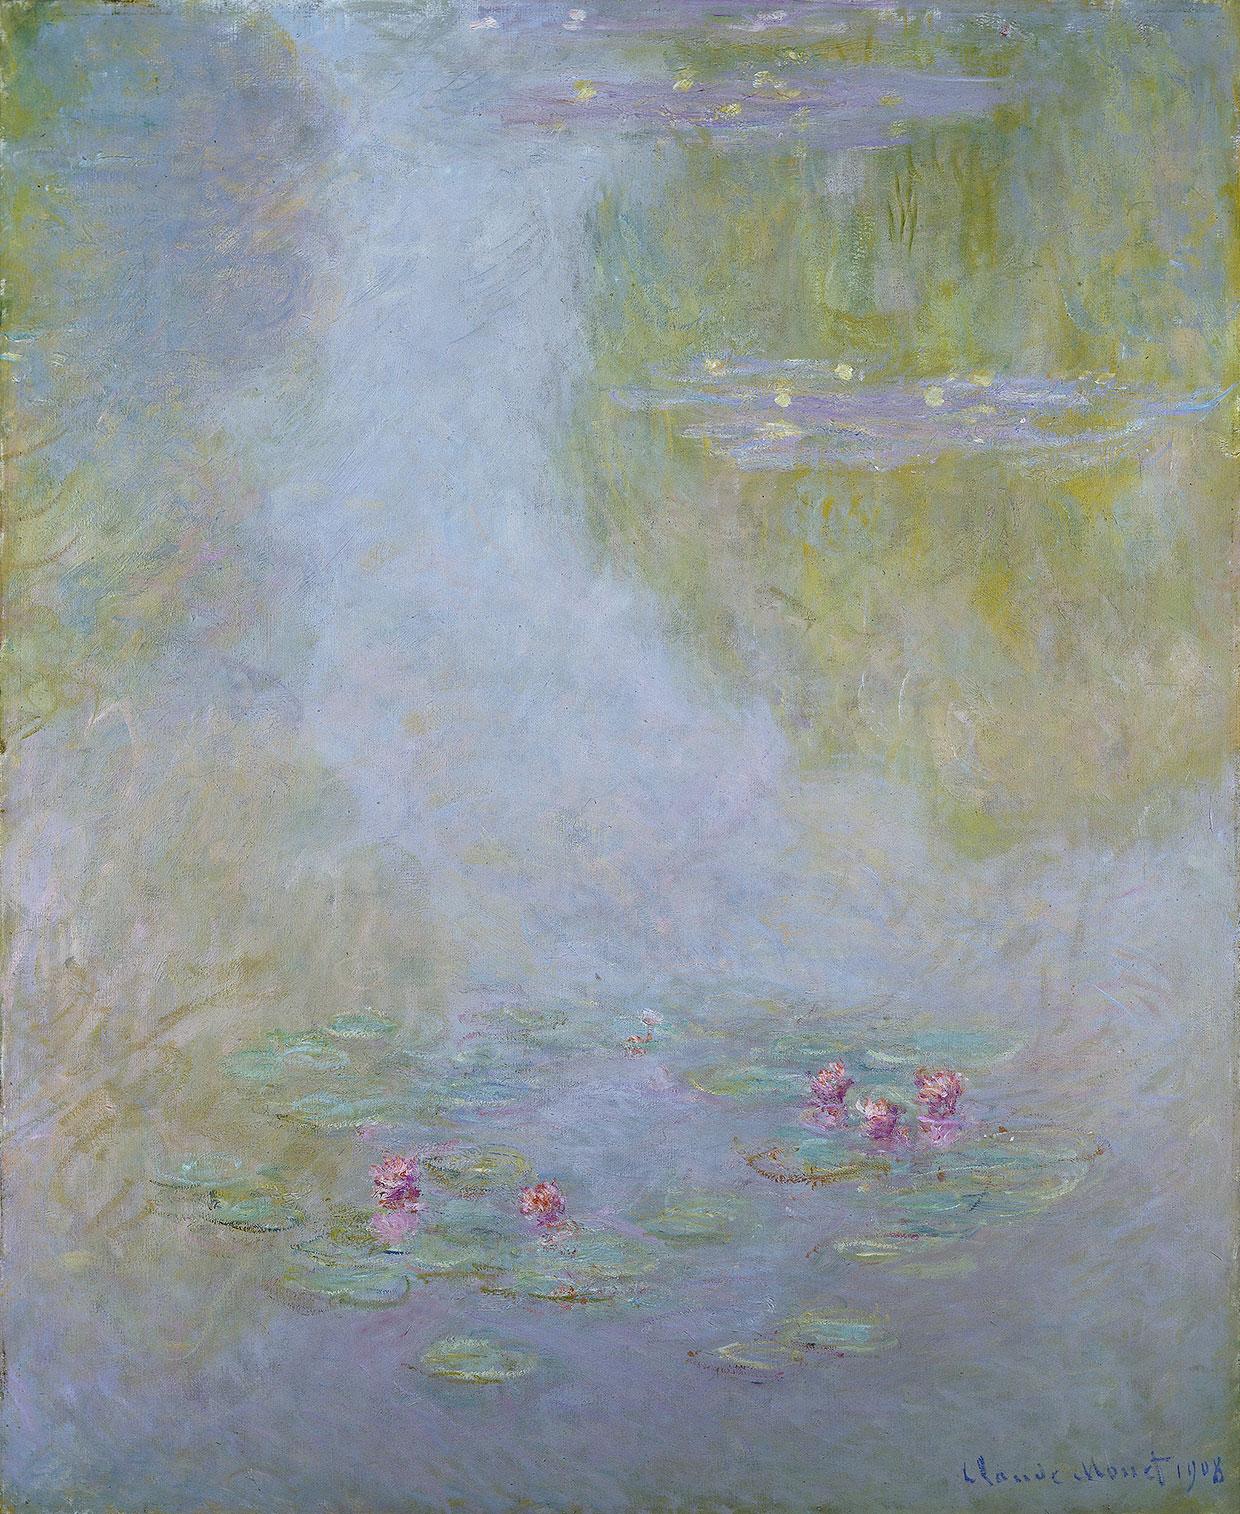 Claude Monet, Water Lilies, 1908. Amgueddfa Cymru - National Museum Wales. Bequeathed by Gwendoline Davies, 1951. Photo: National Museum Wales